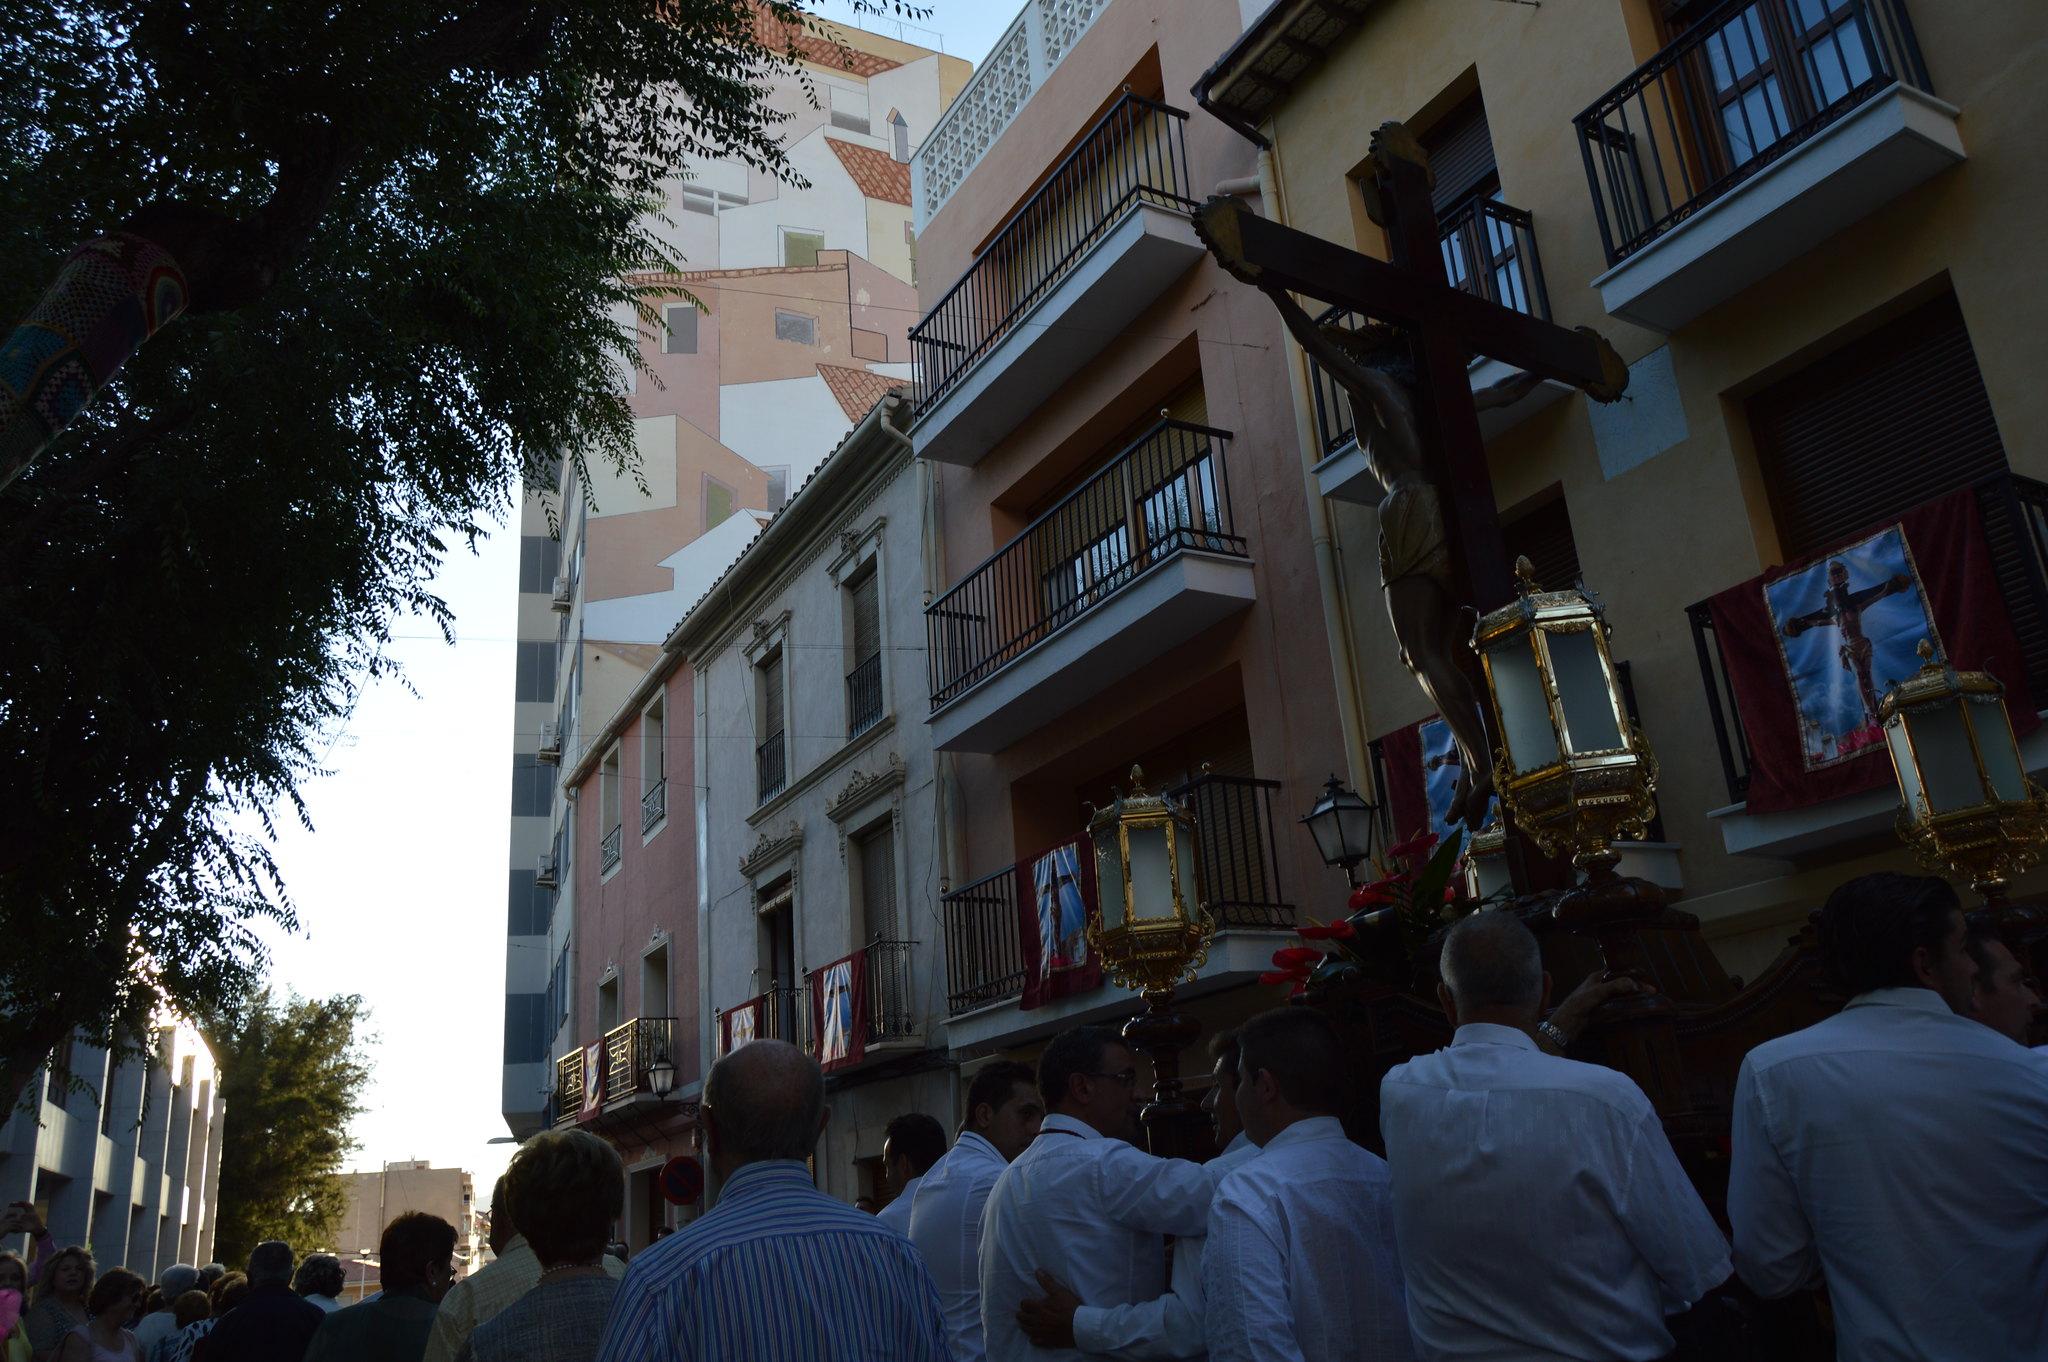 (2017-07-02) Procesión de subida (Adrián Romero Montesinos) (16)